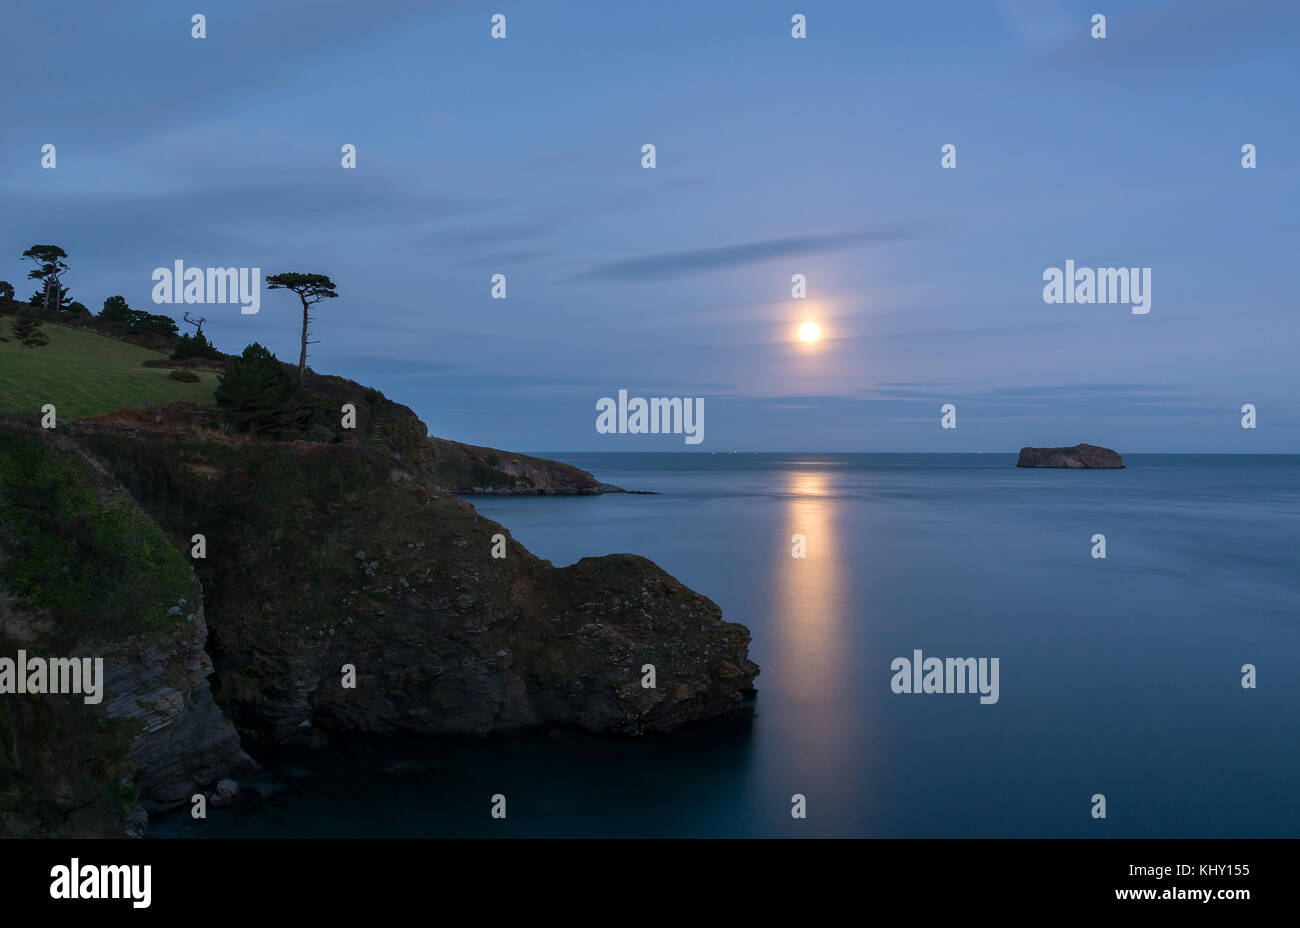 Ore Stone, Torquay By Moonlight - Stock Image